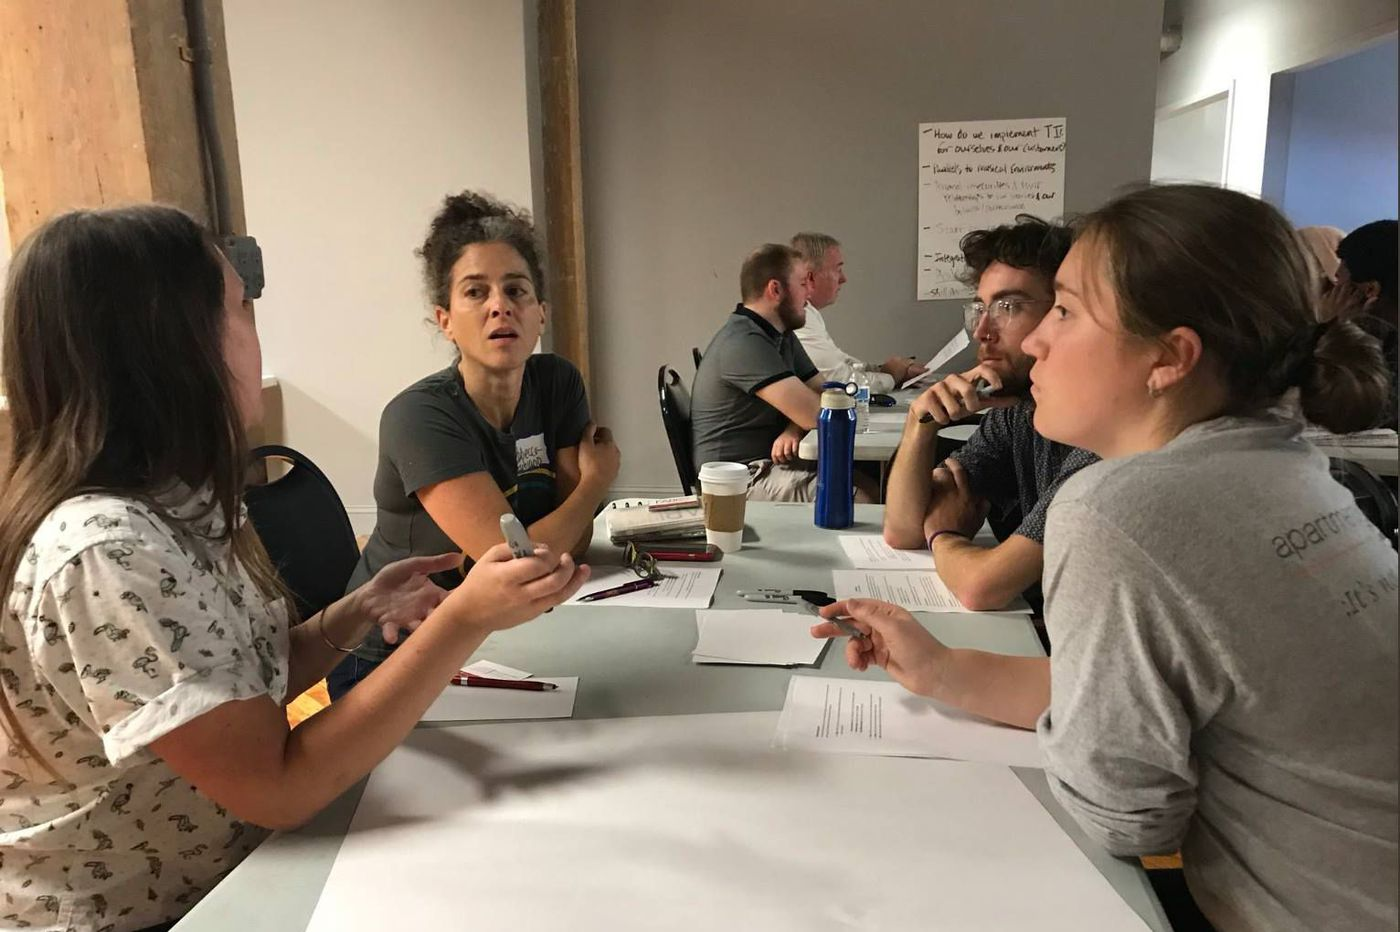 Behind the scenes with Kensington's community newsroom